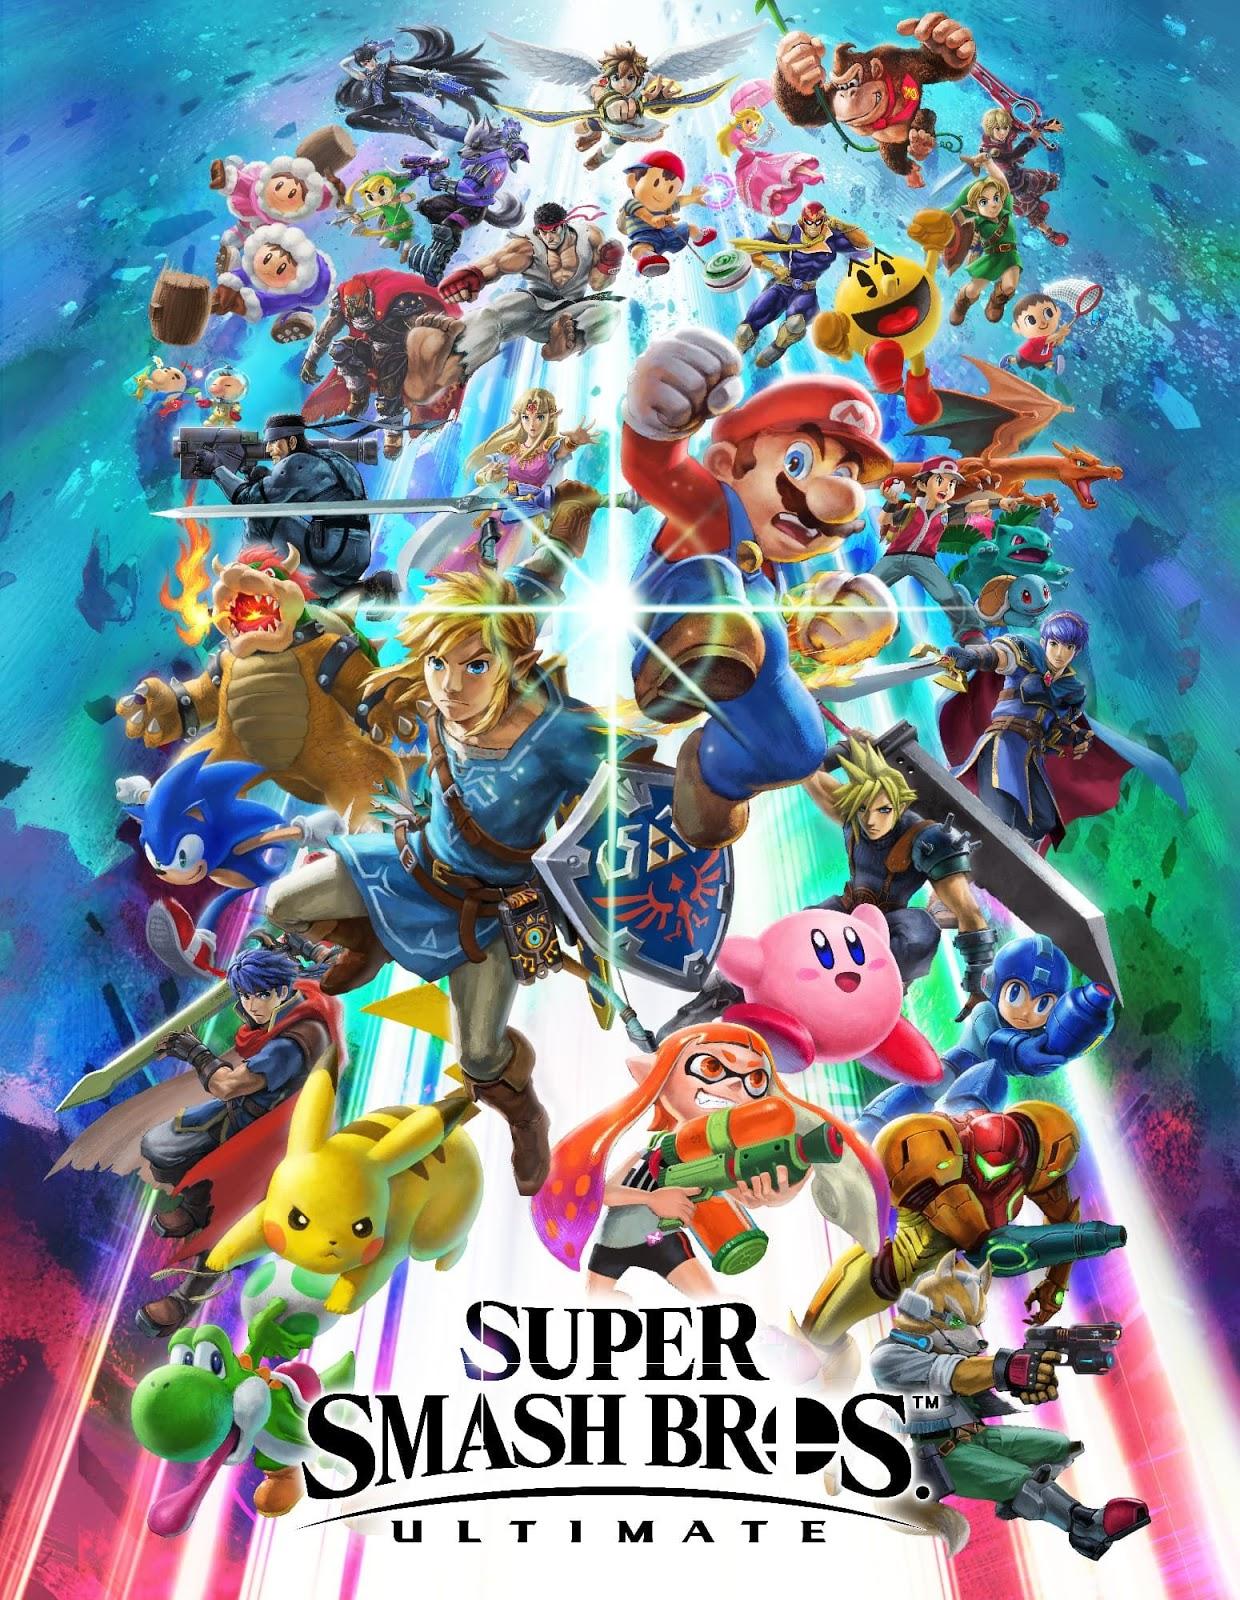 Using Previous Smash Games To Predict The Smash Bros Ultimate